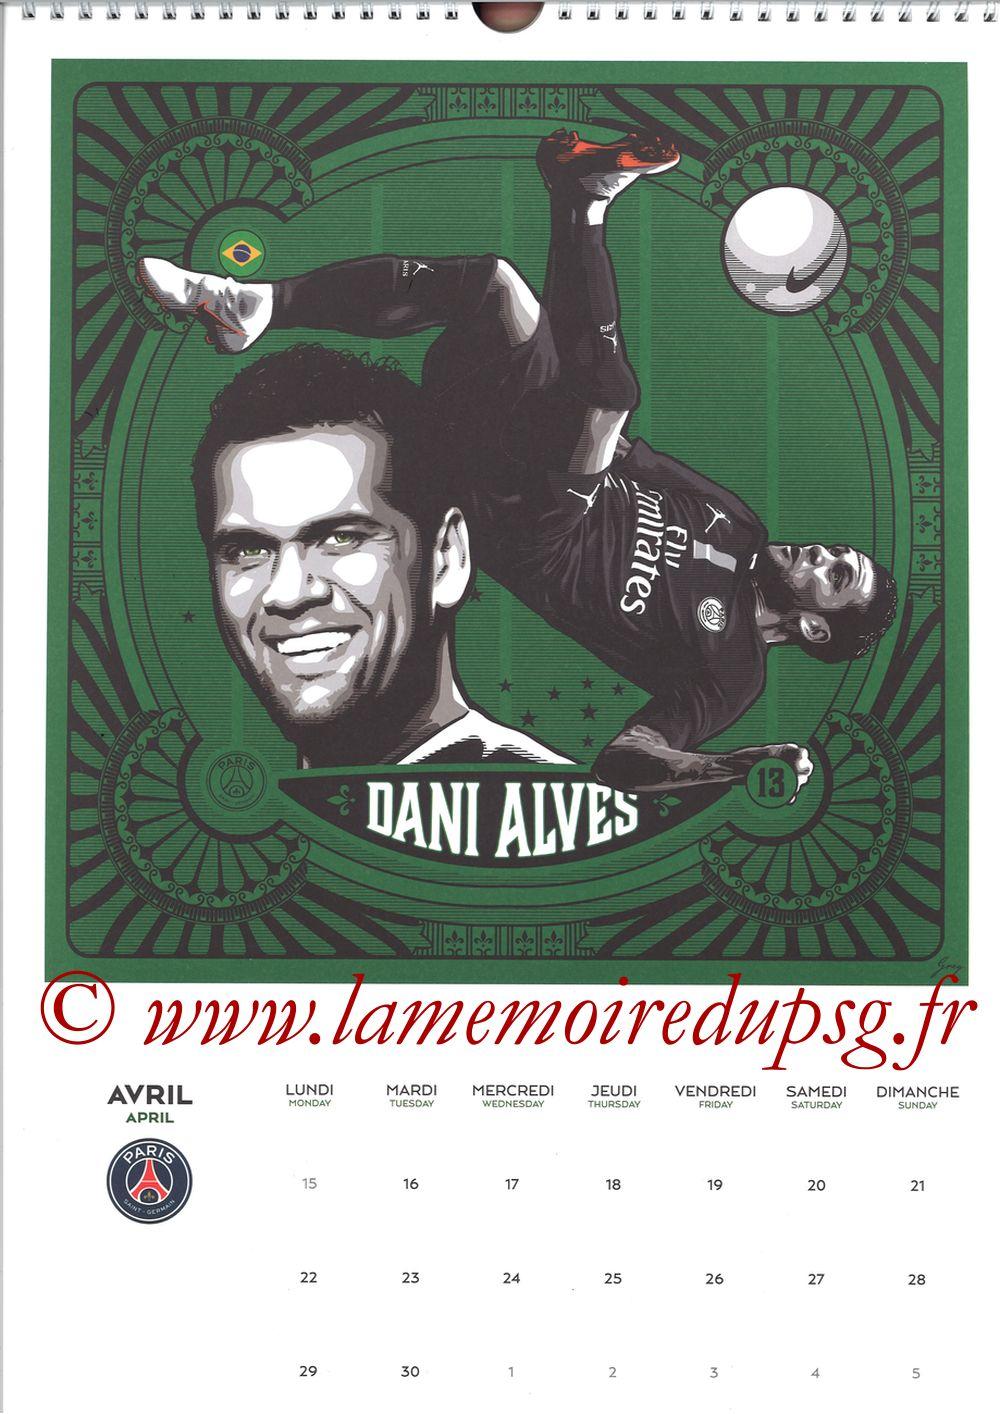 Calendrier PSG 2019 - Page 08 - Dani ALVES